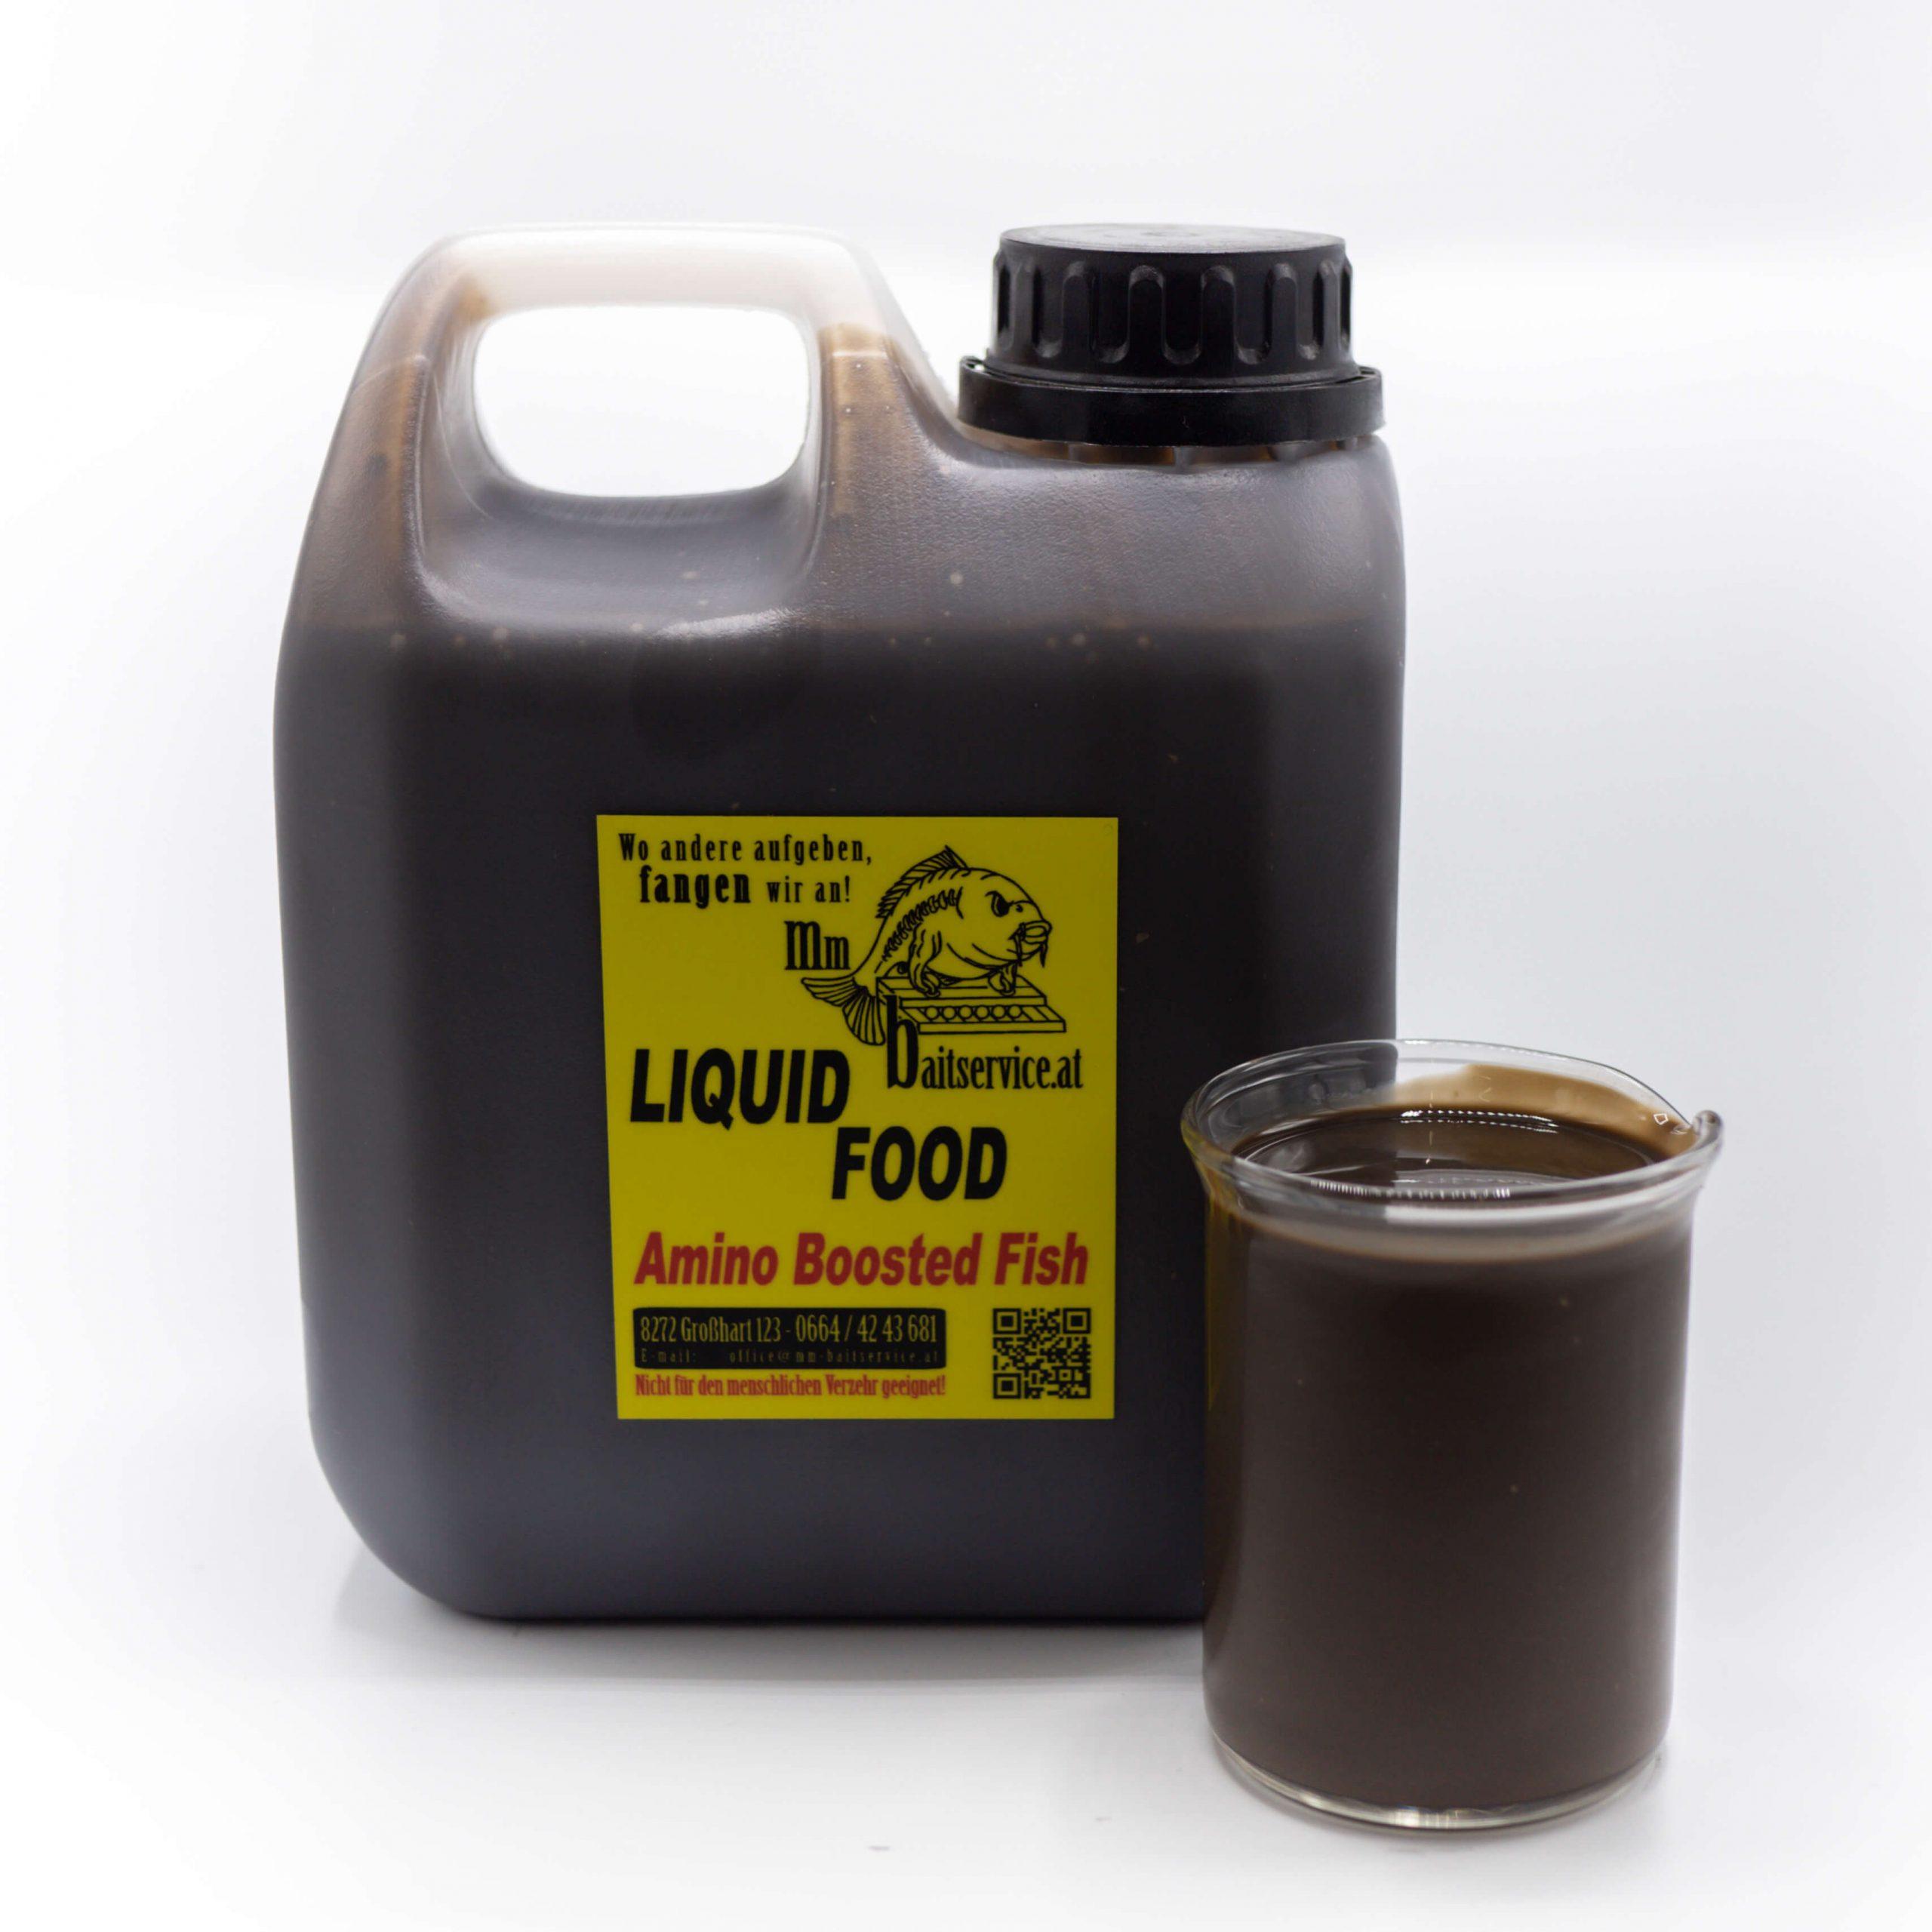 Amino Boosted Fish - Liquid